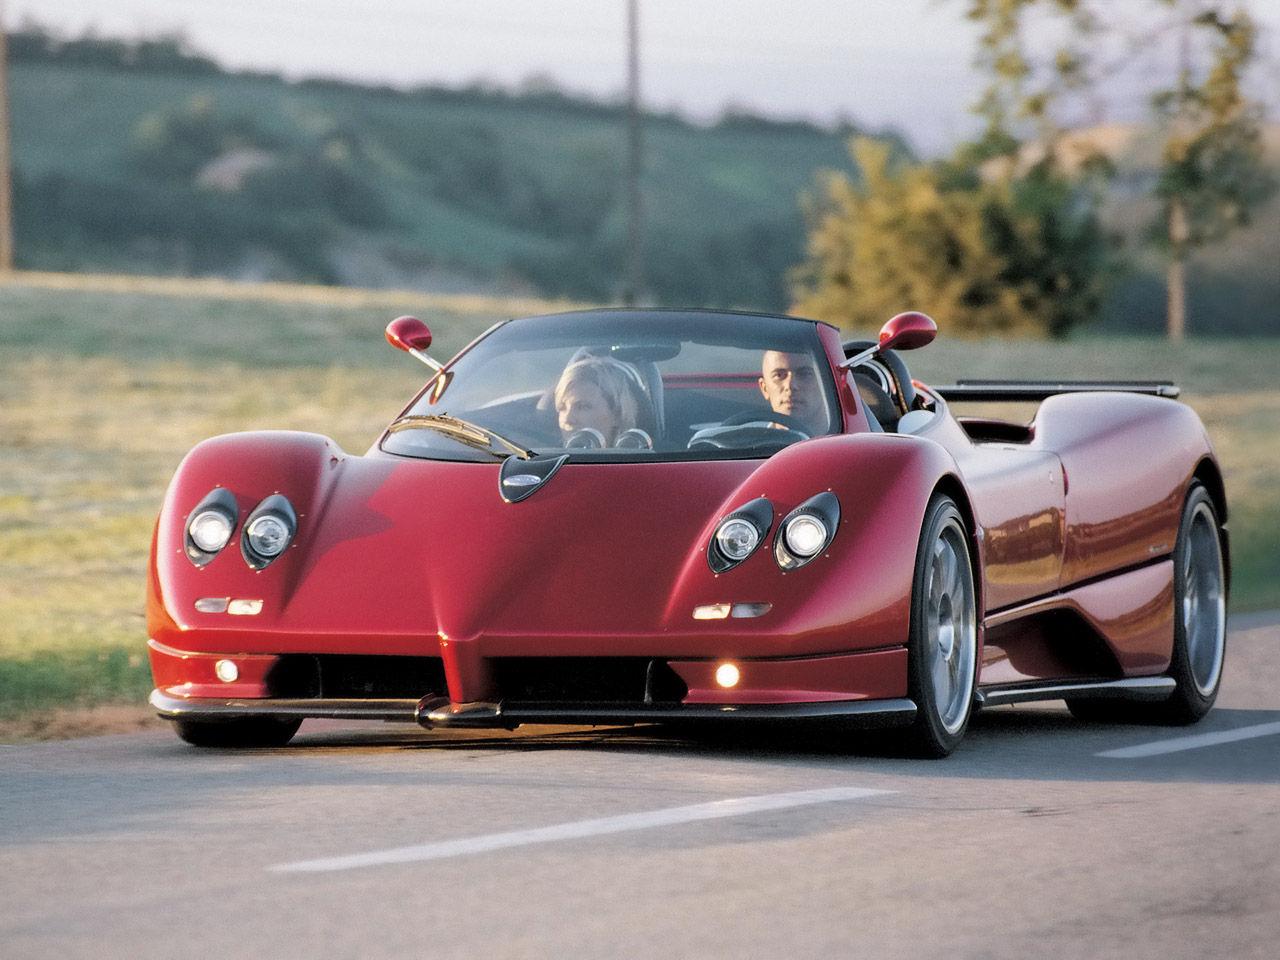 Worlds Sickest Cars Gallery Wix Com